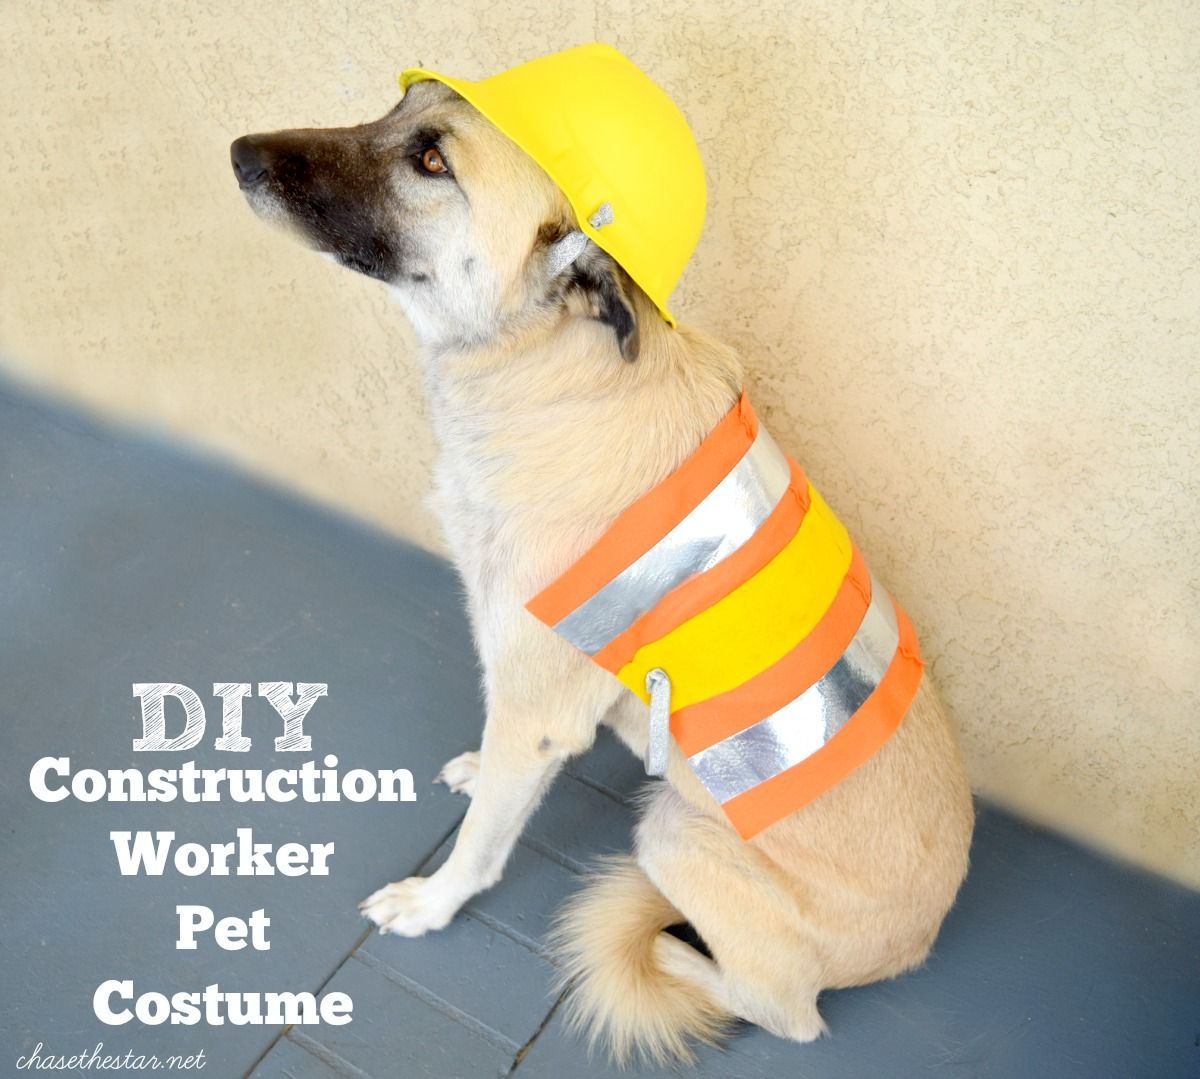 Diy Pet Costume Pet Costumes Diy Pet Costumes Dog Halloween